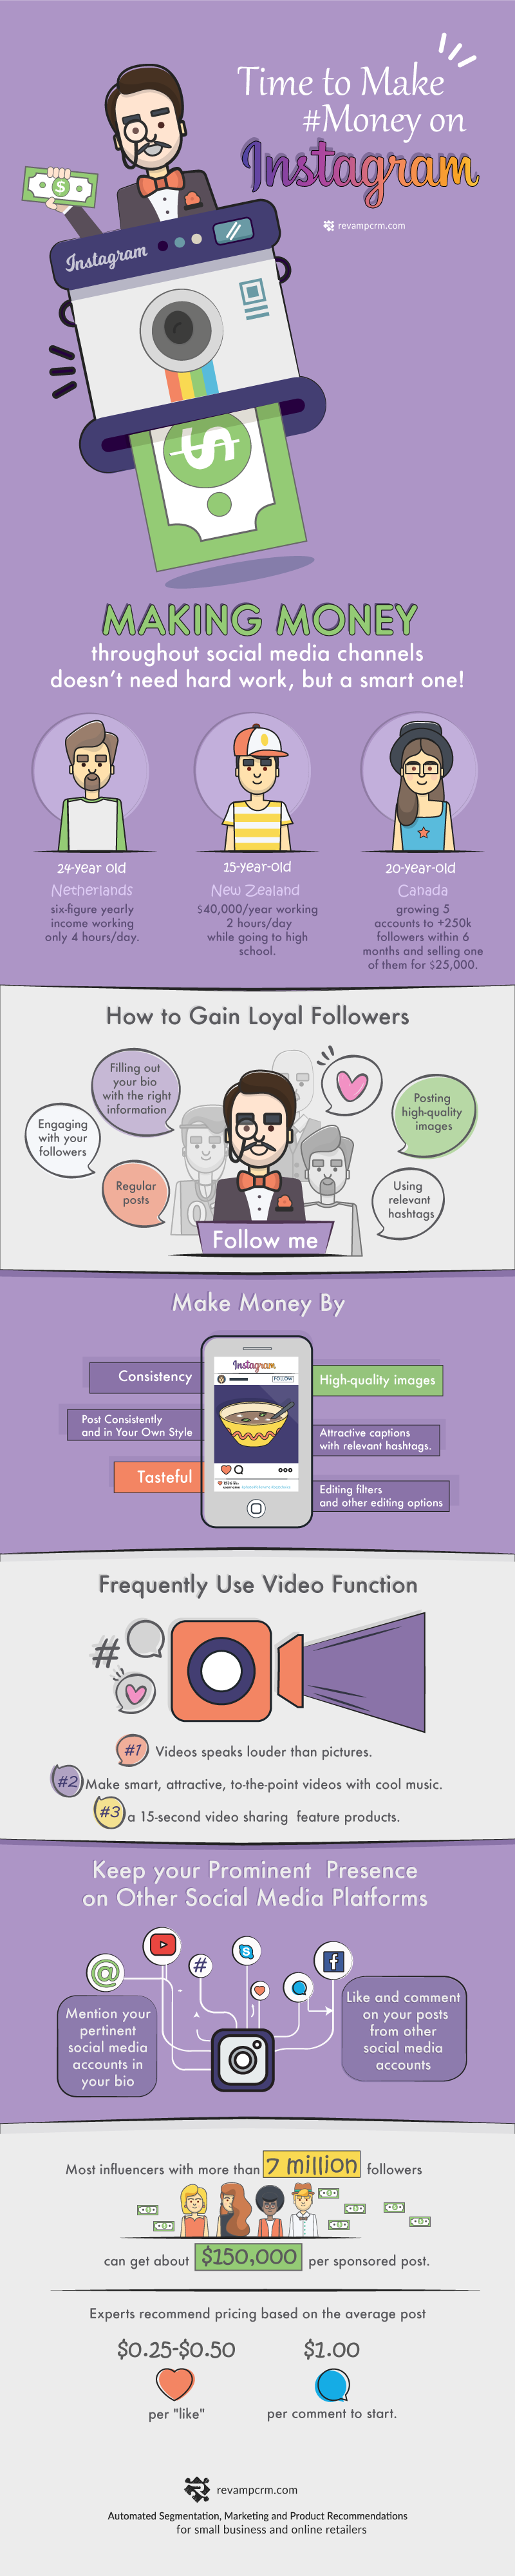 Make-Money-on-Instagram3